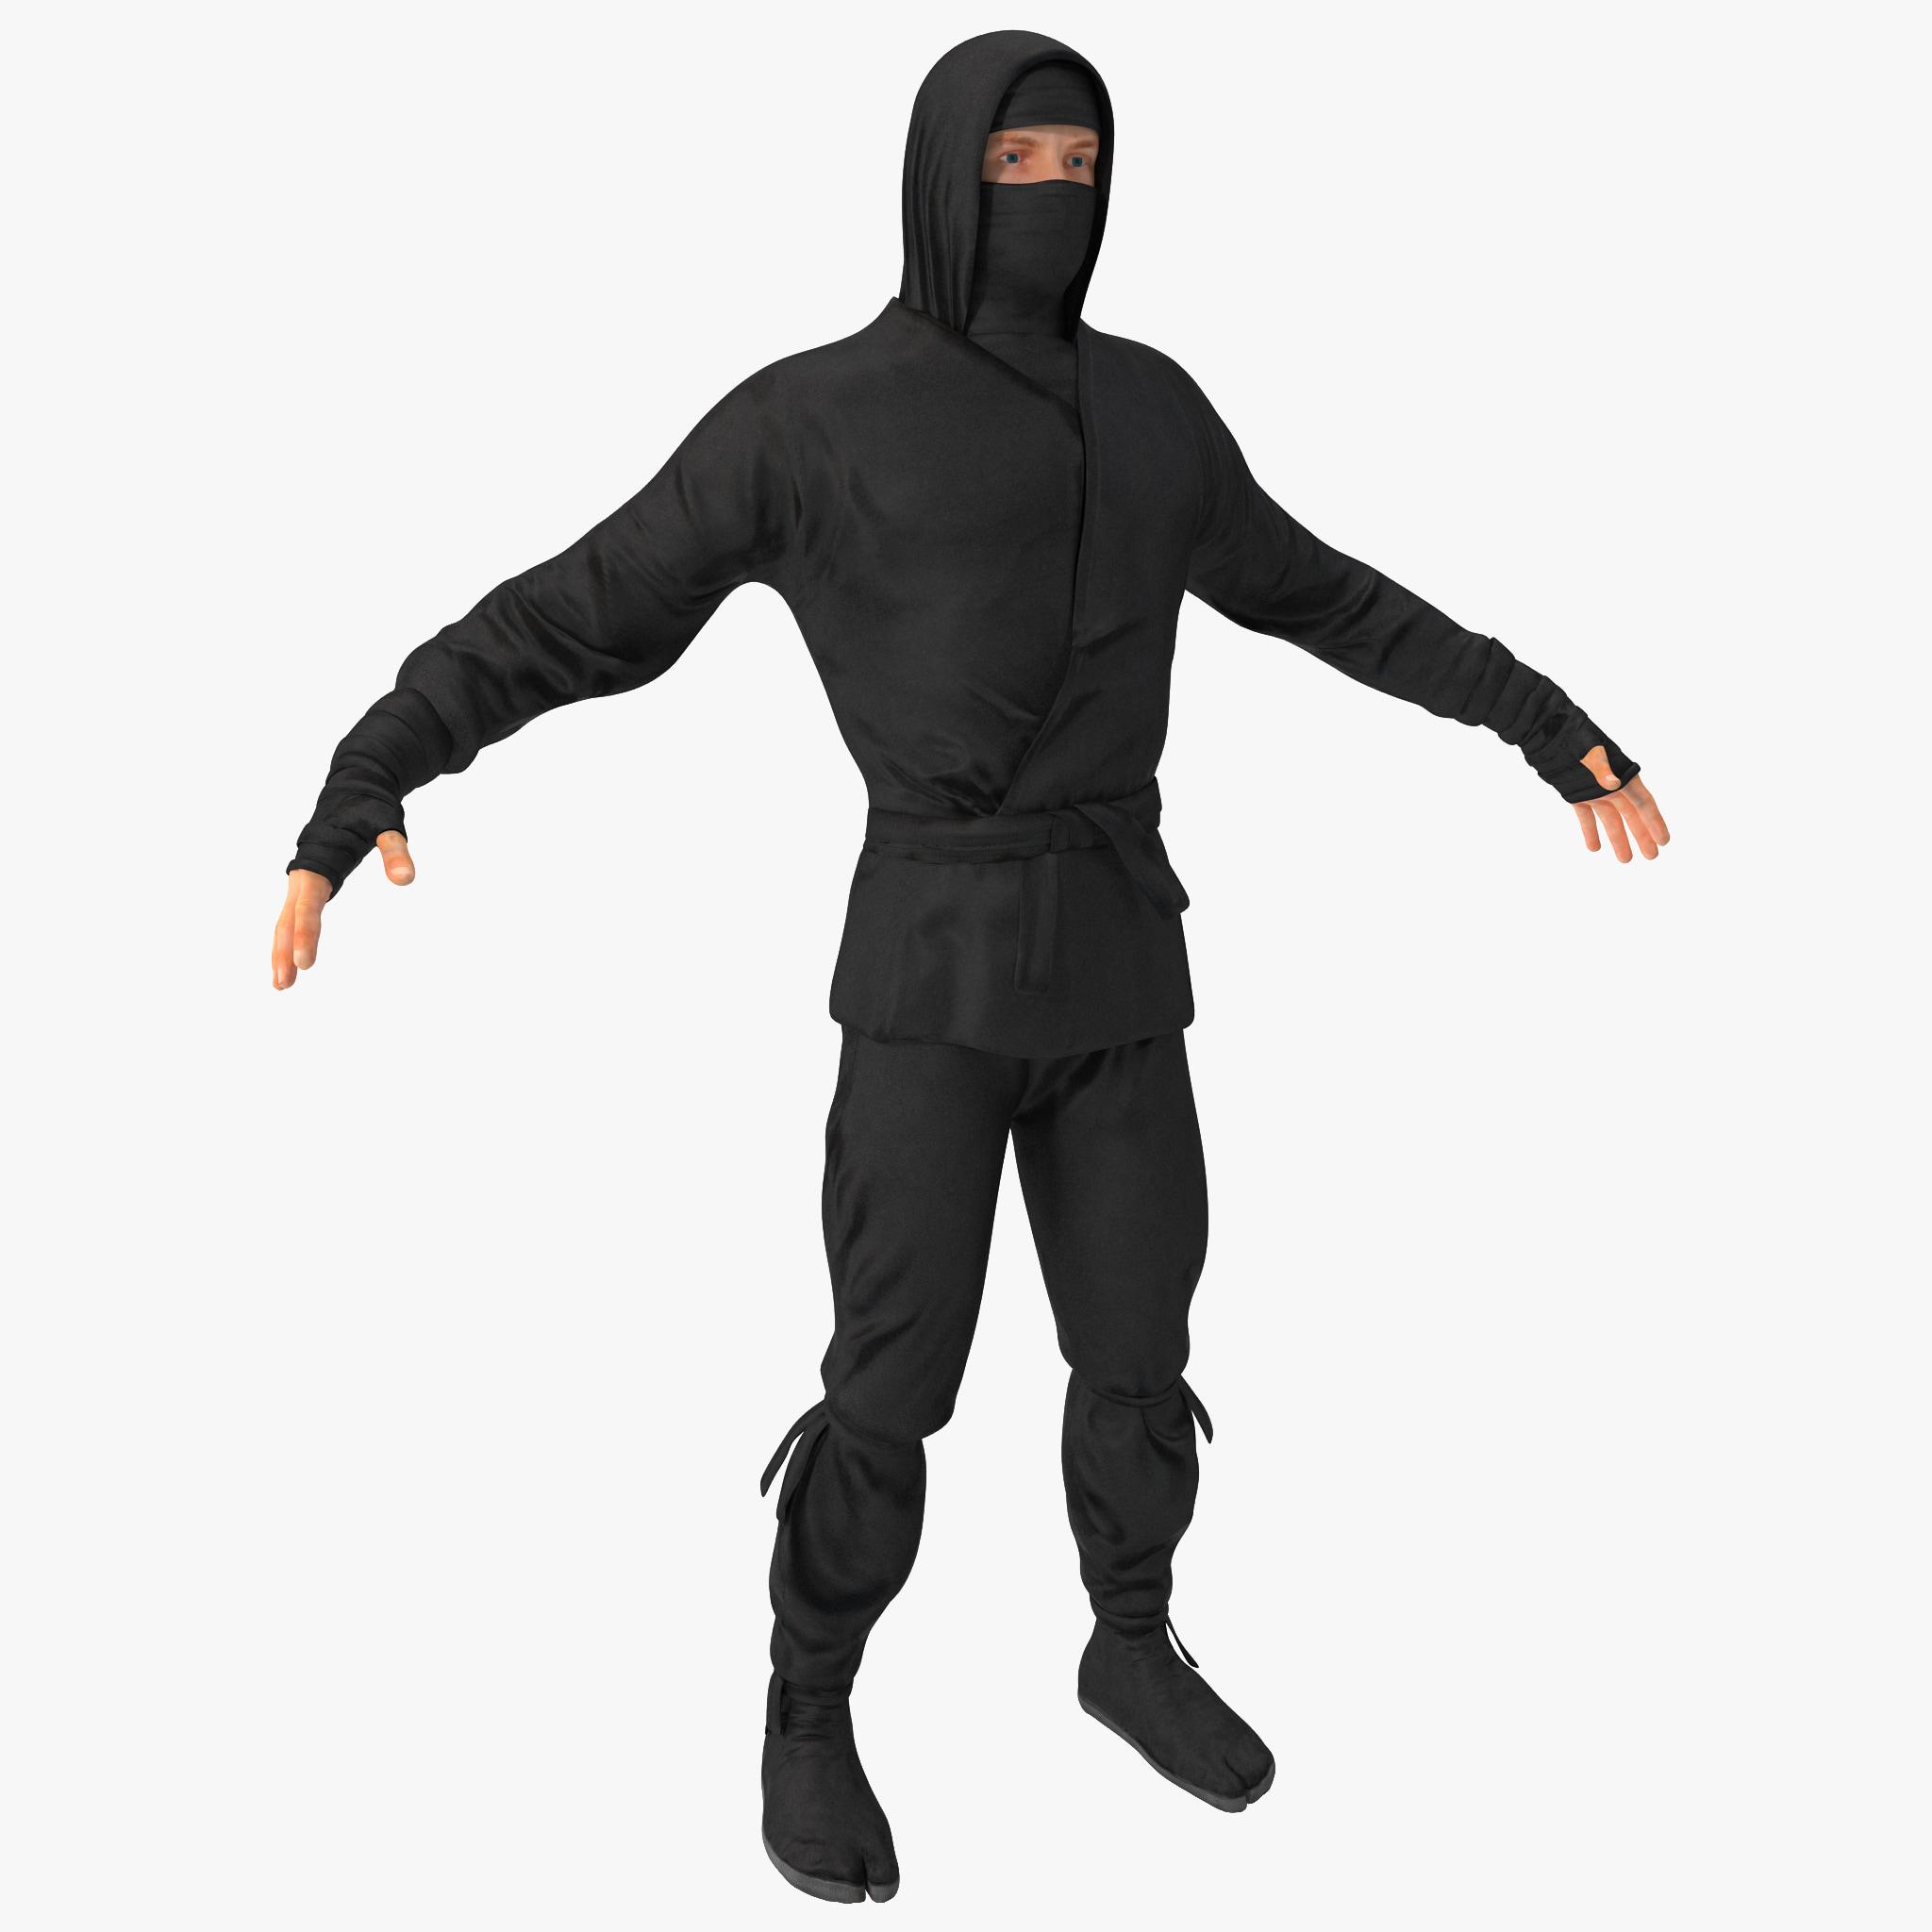 Ninja Rigged_1.jpg